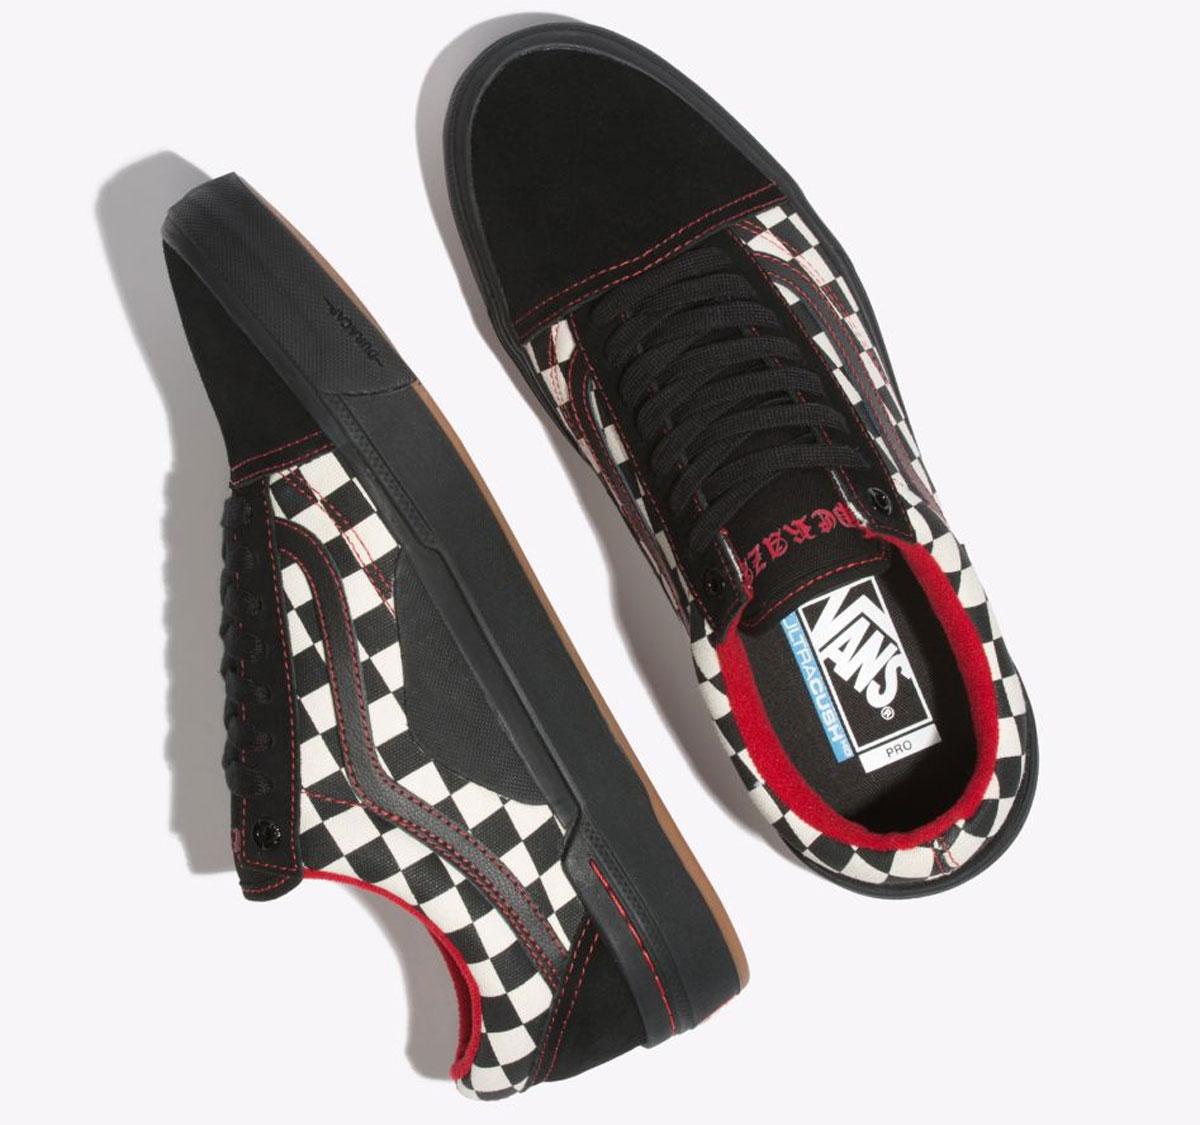 Vans Kevin Peraza Old Skool Pro Colorway Shoe BMX